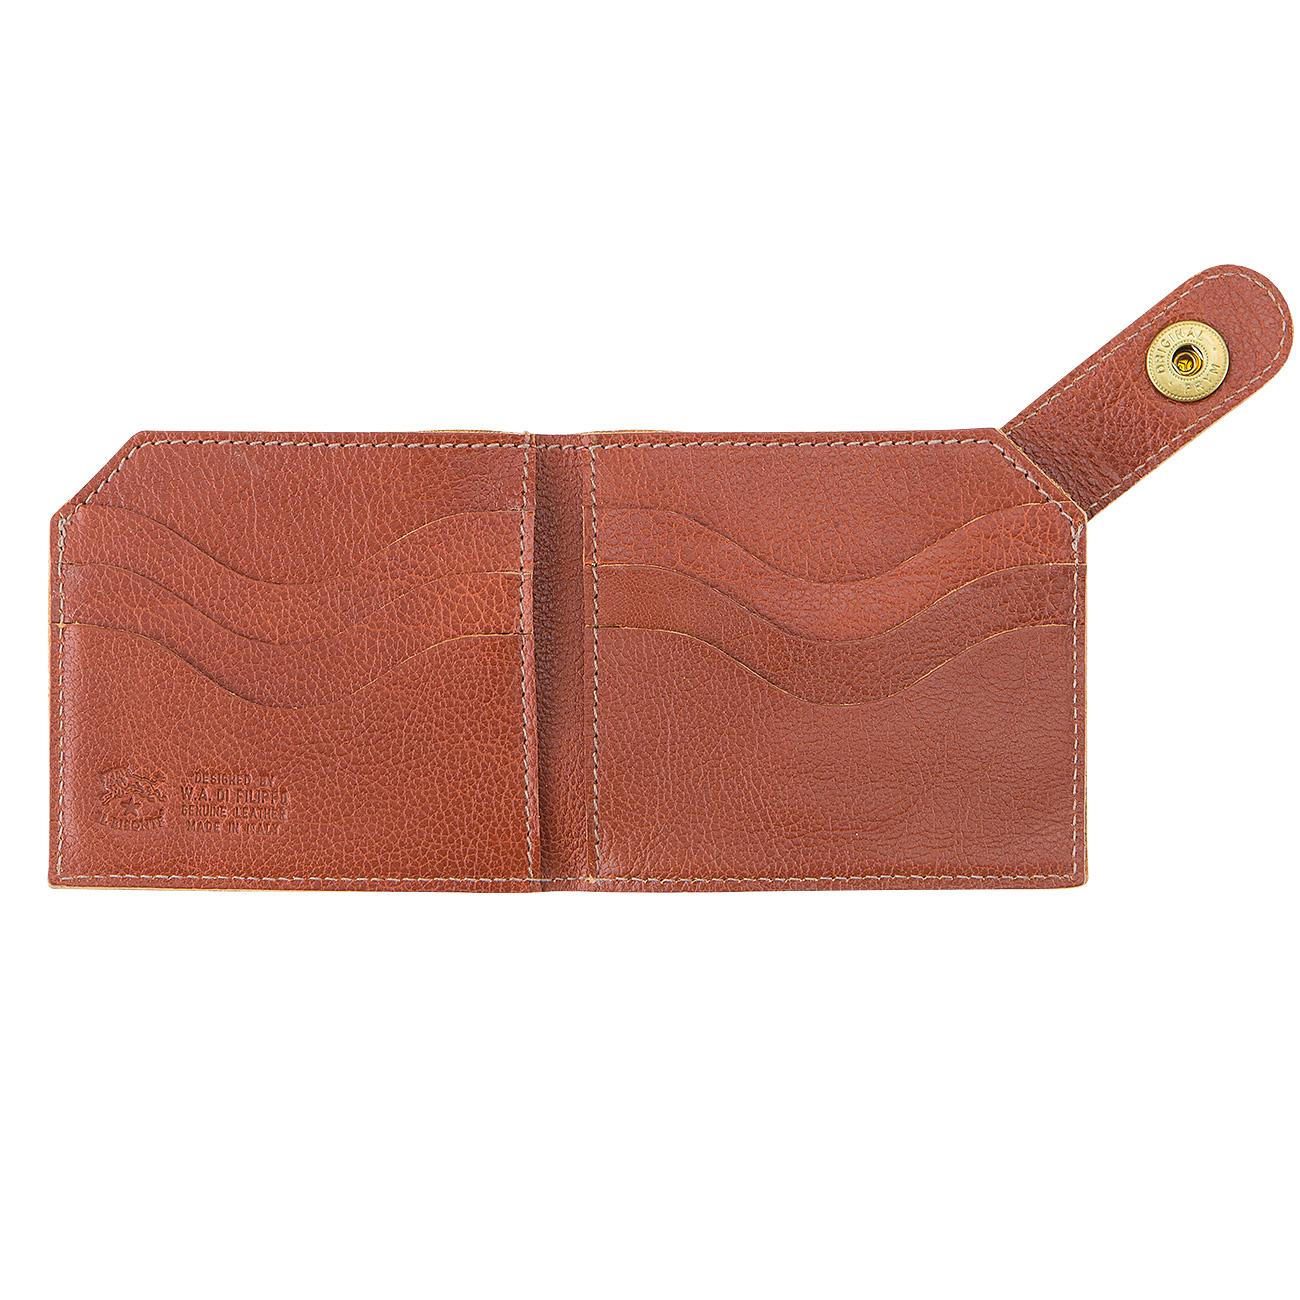 IL BISONTE (イル ビゾンテ) 日本公式オンラインストア 二つ折り財布 5412305240